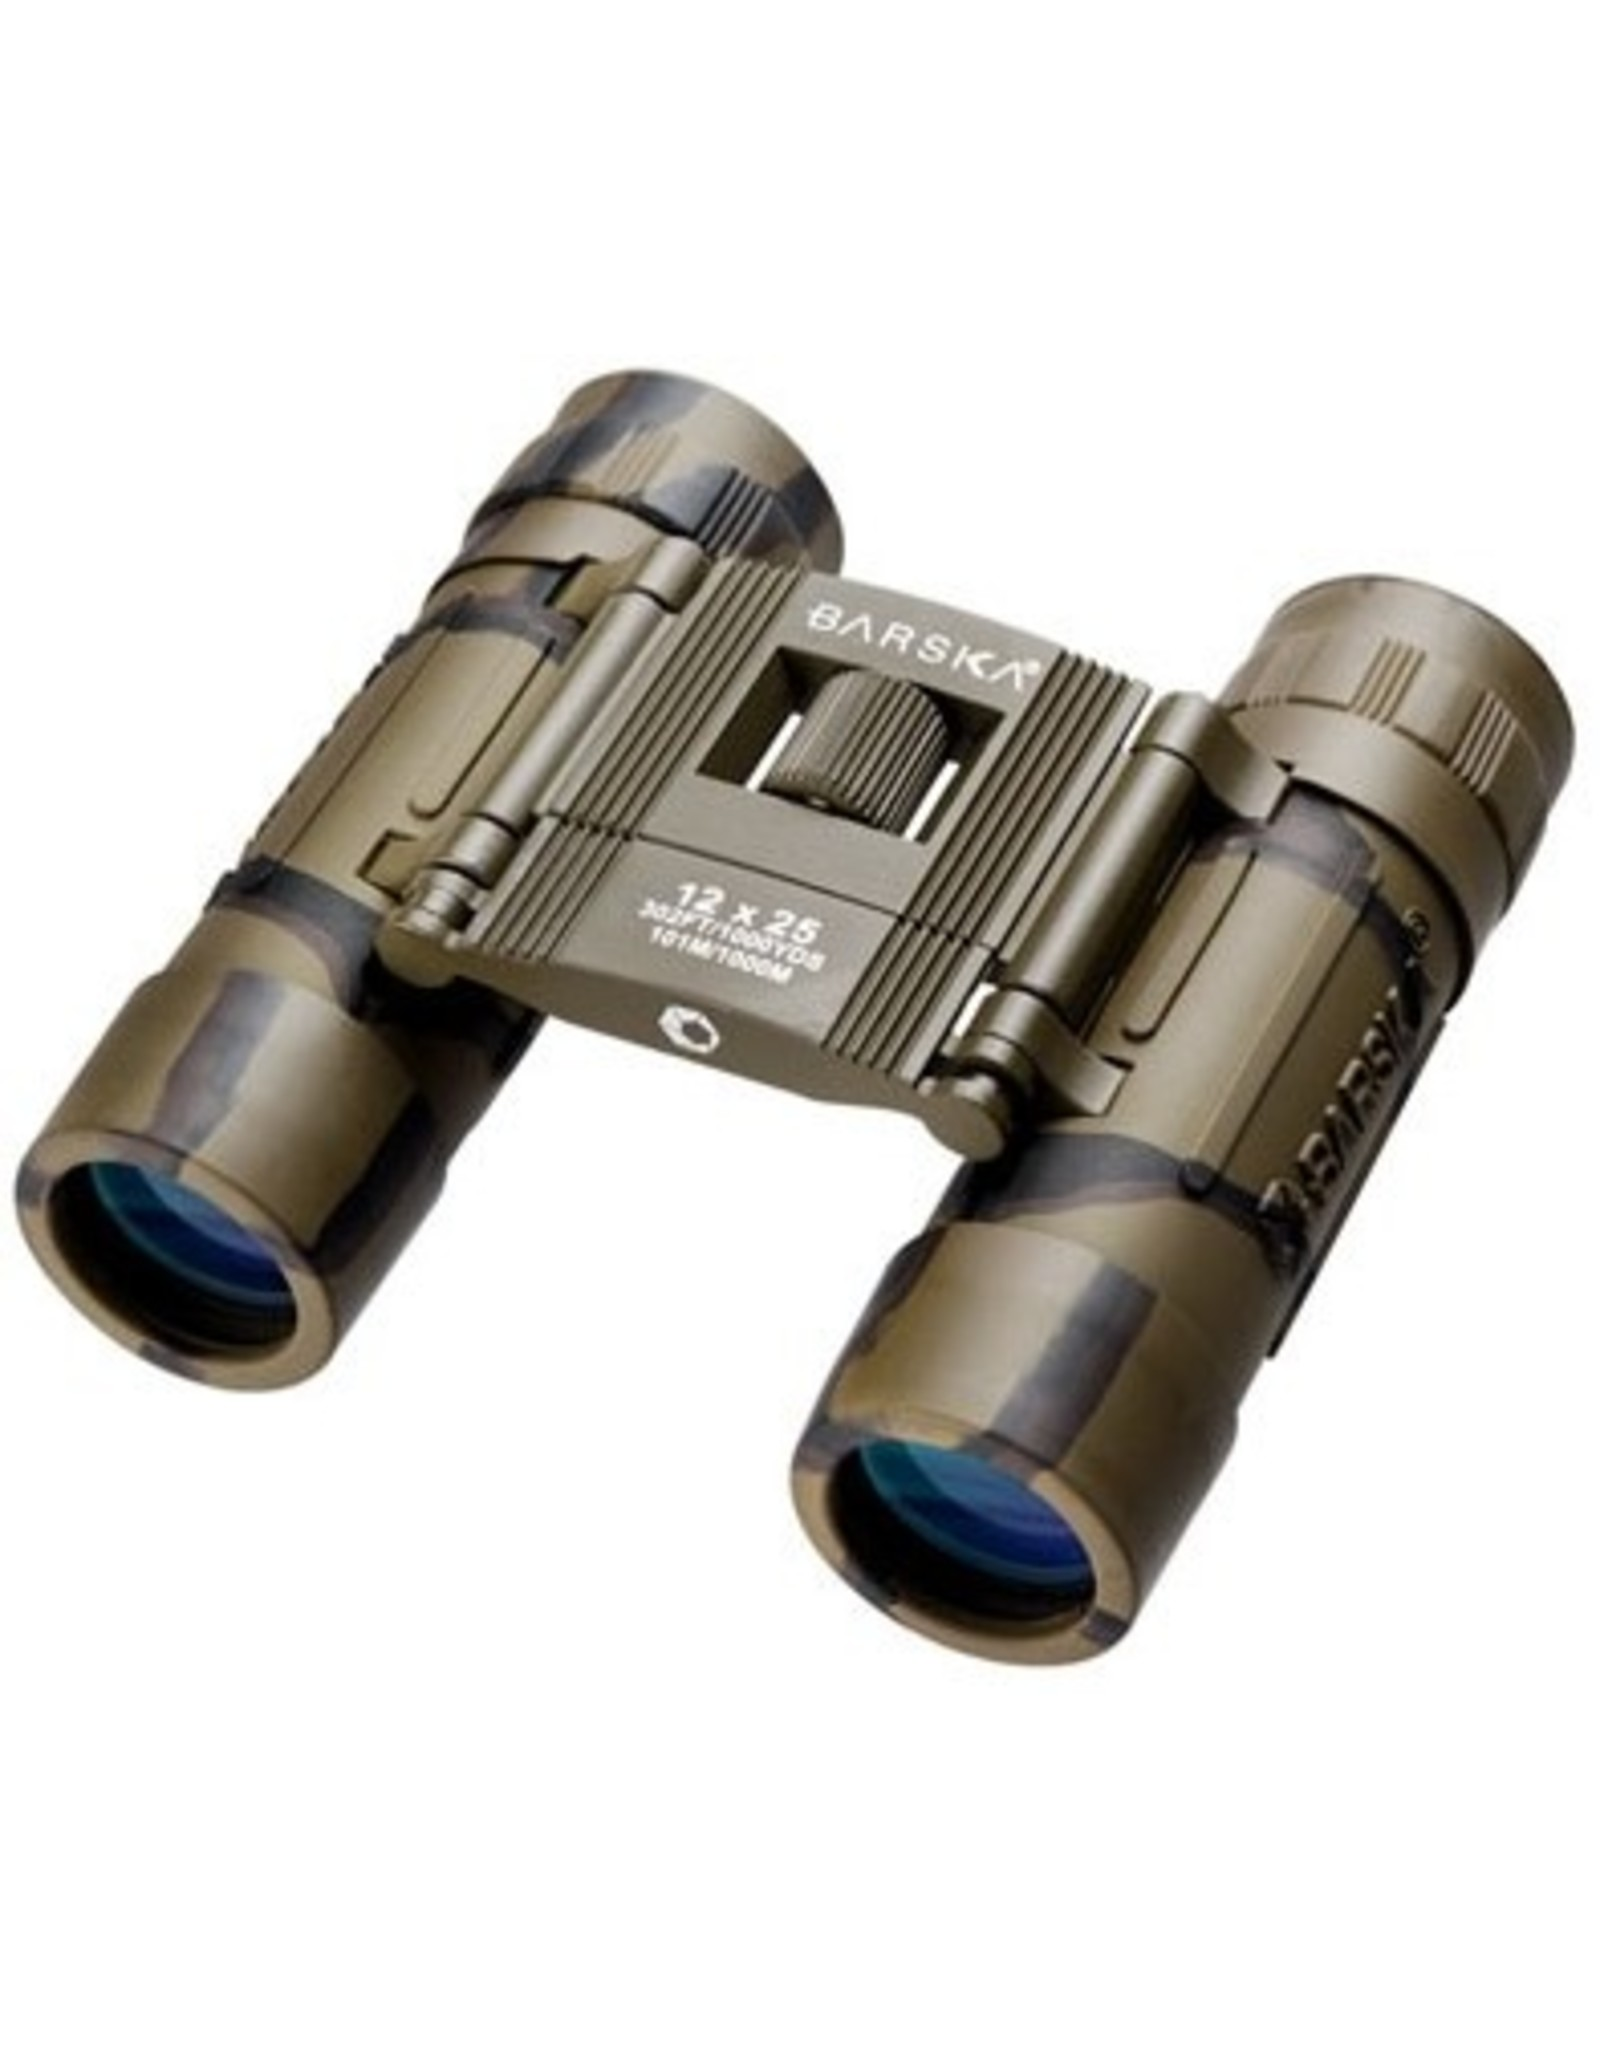 BARSKA OPTICS 12X25 LUCID VIEW COMPACT BINOCULARS